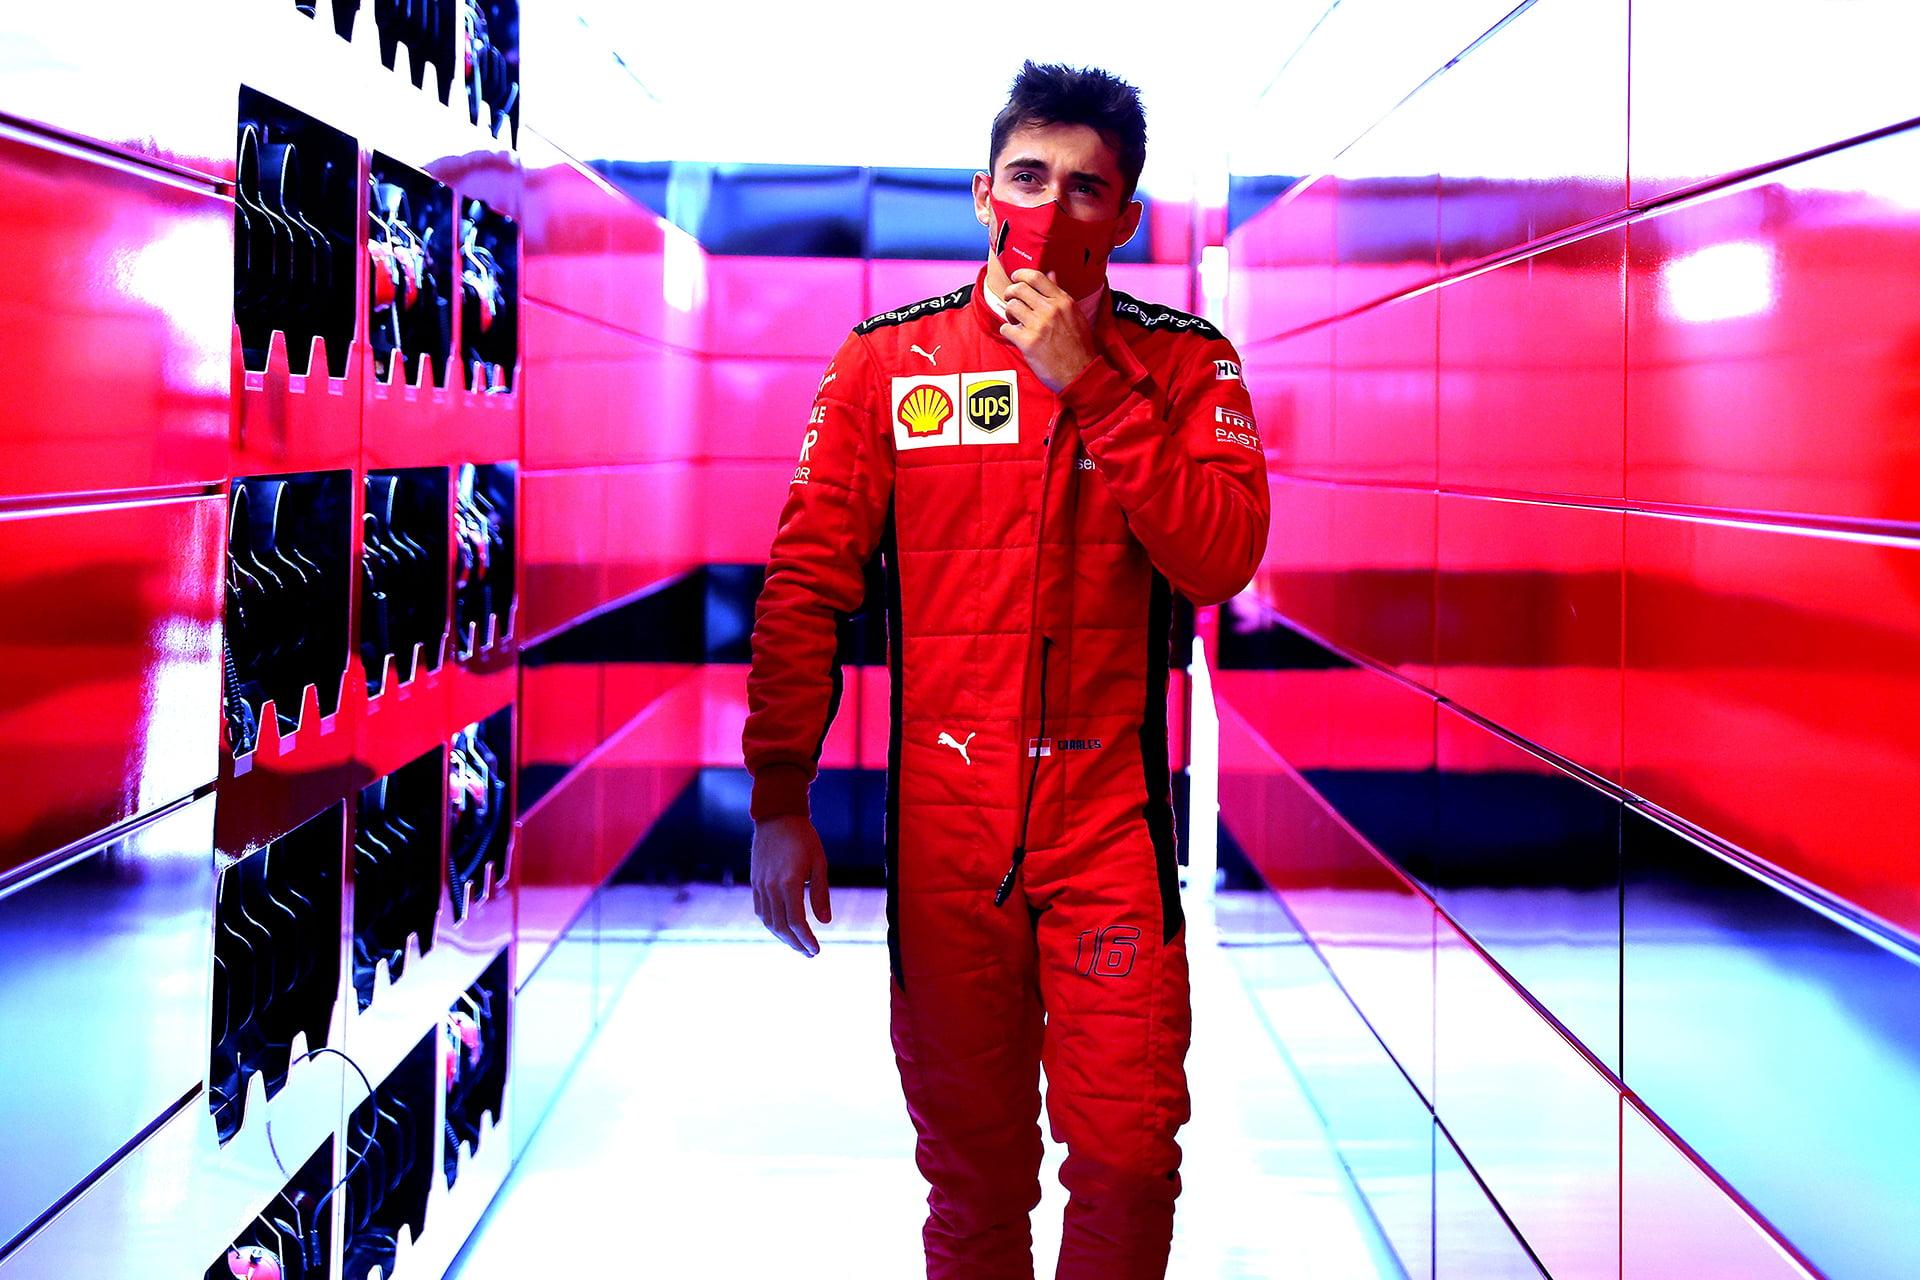 Charles Leclerc analiza la temporada 2020 del Mundial de F1